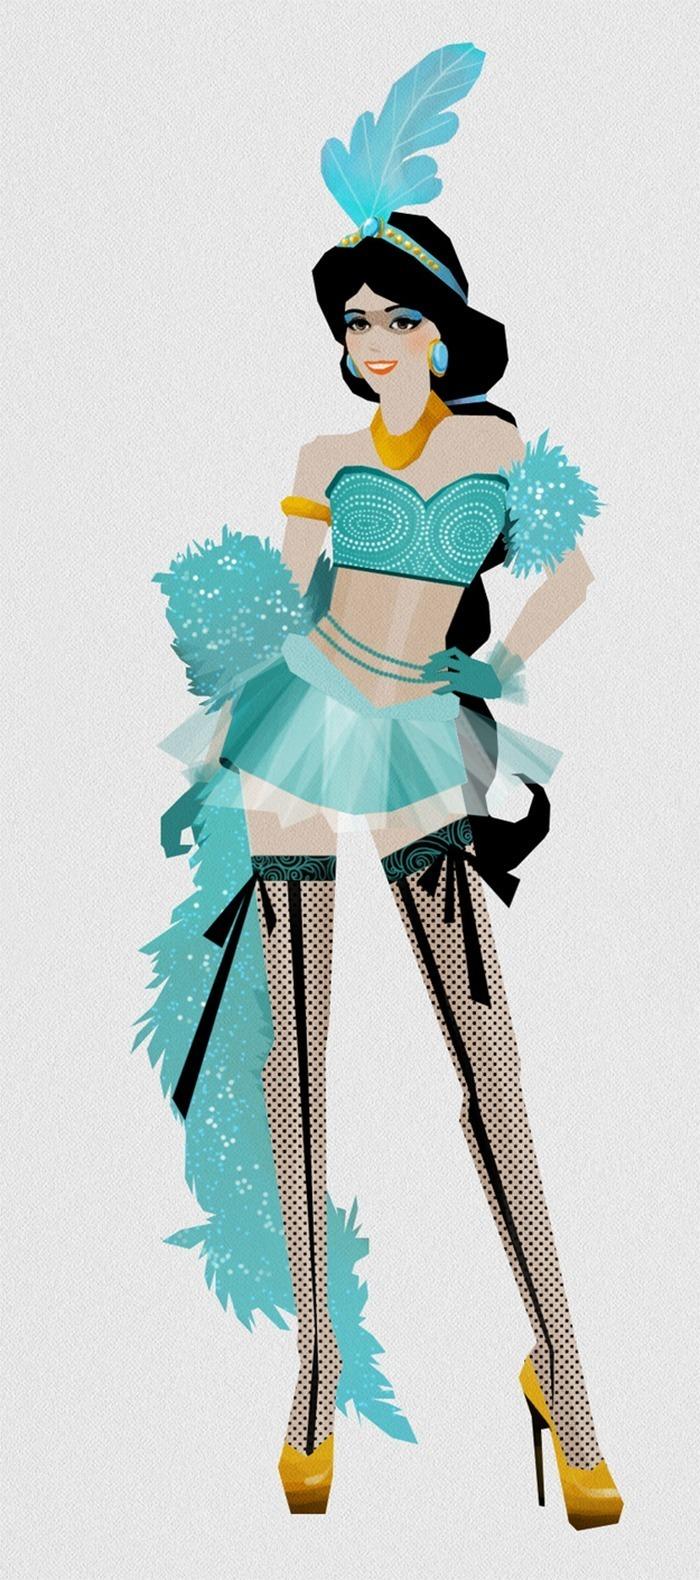 princesas-disney-burlescas-2